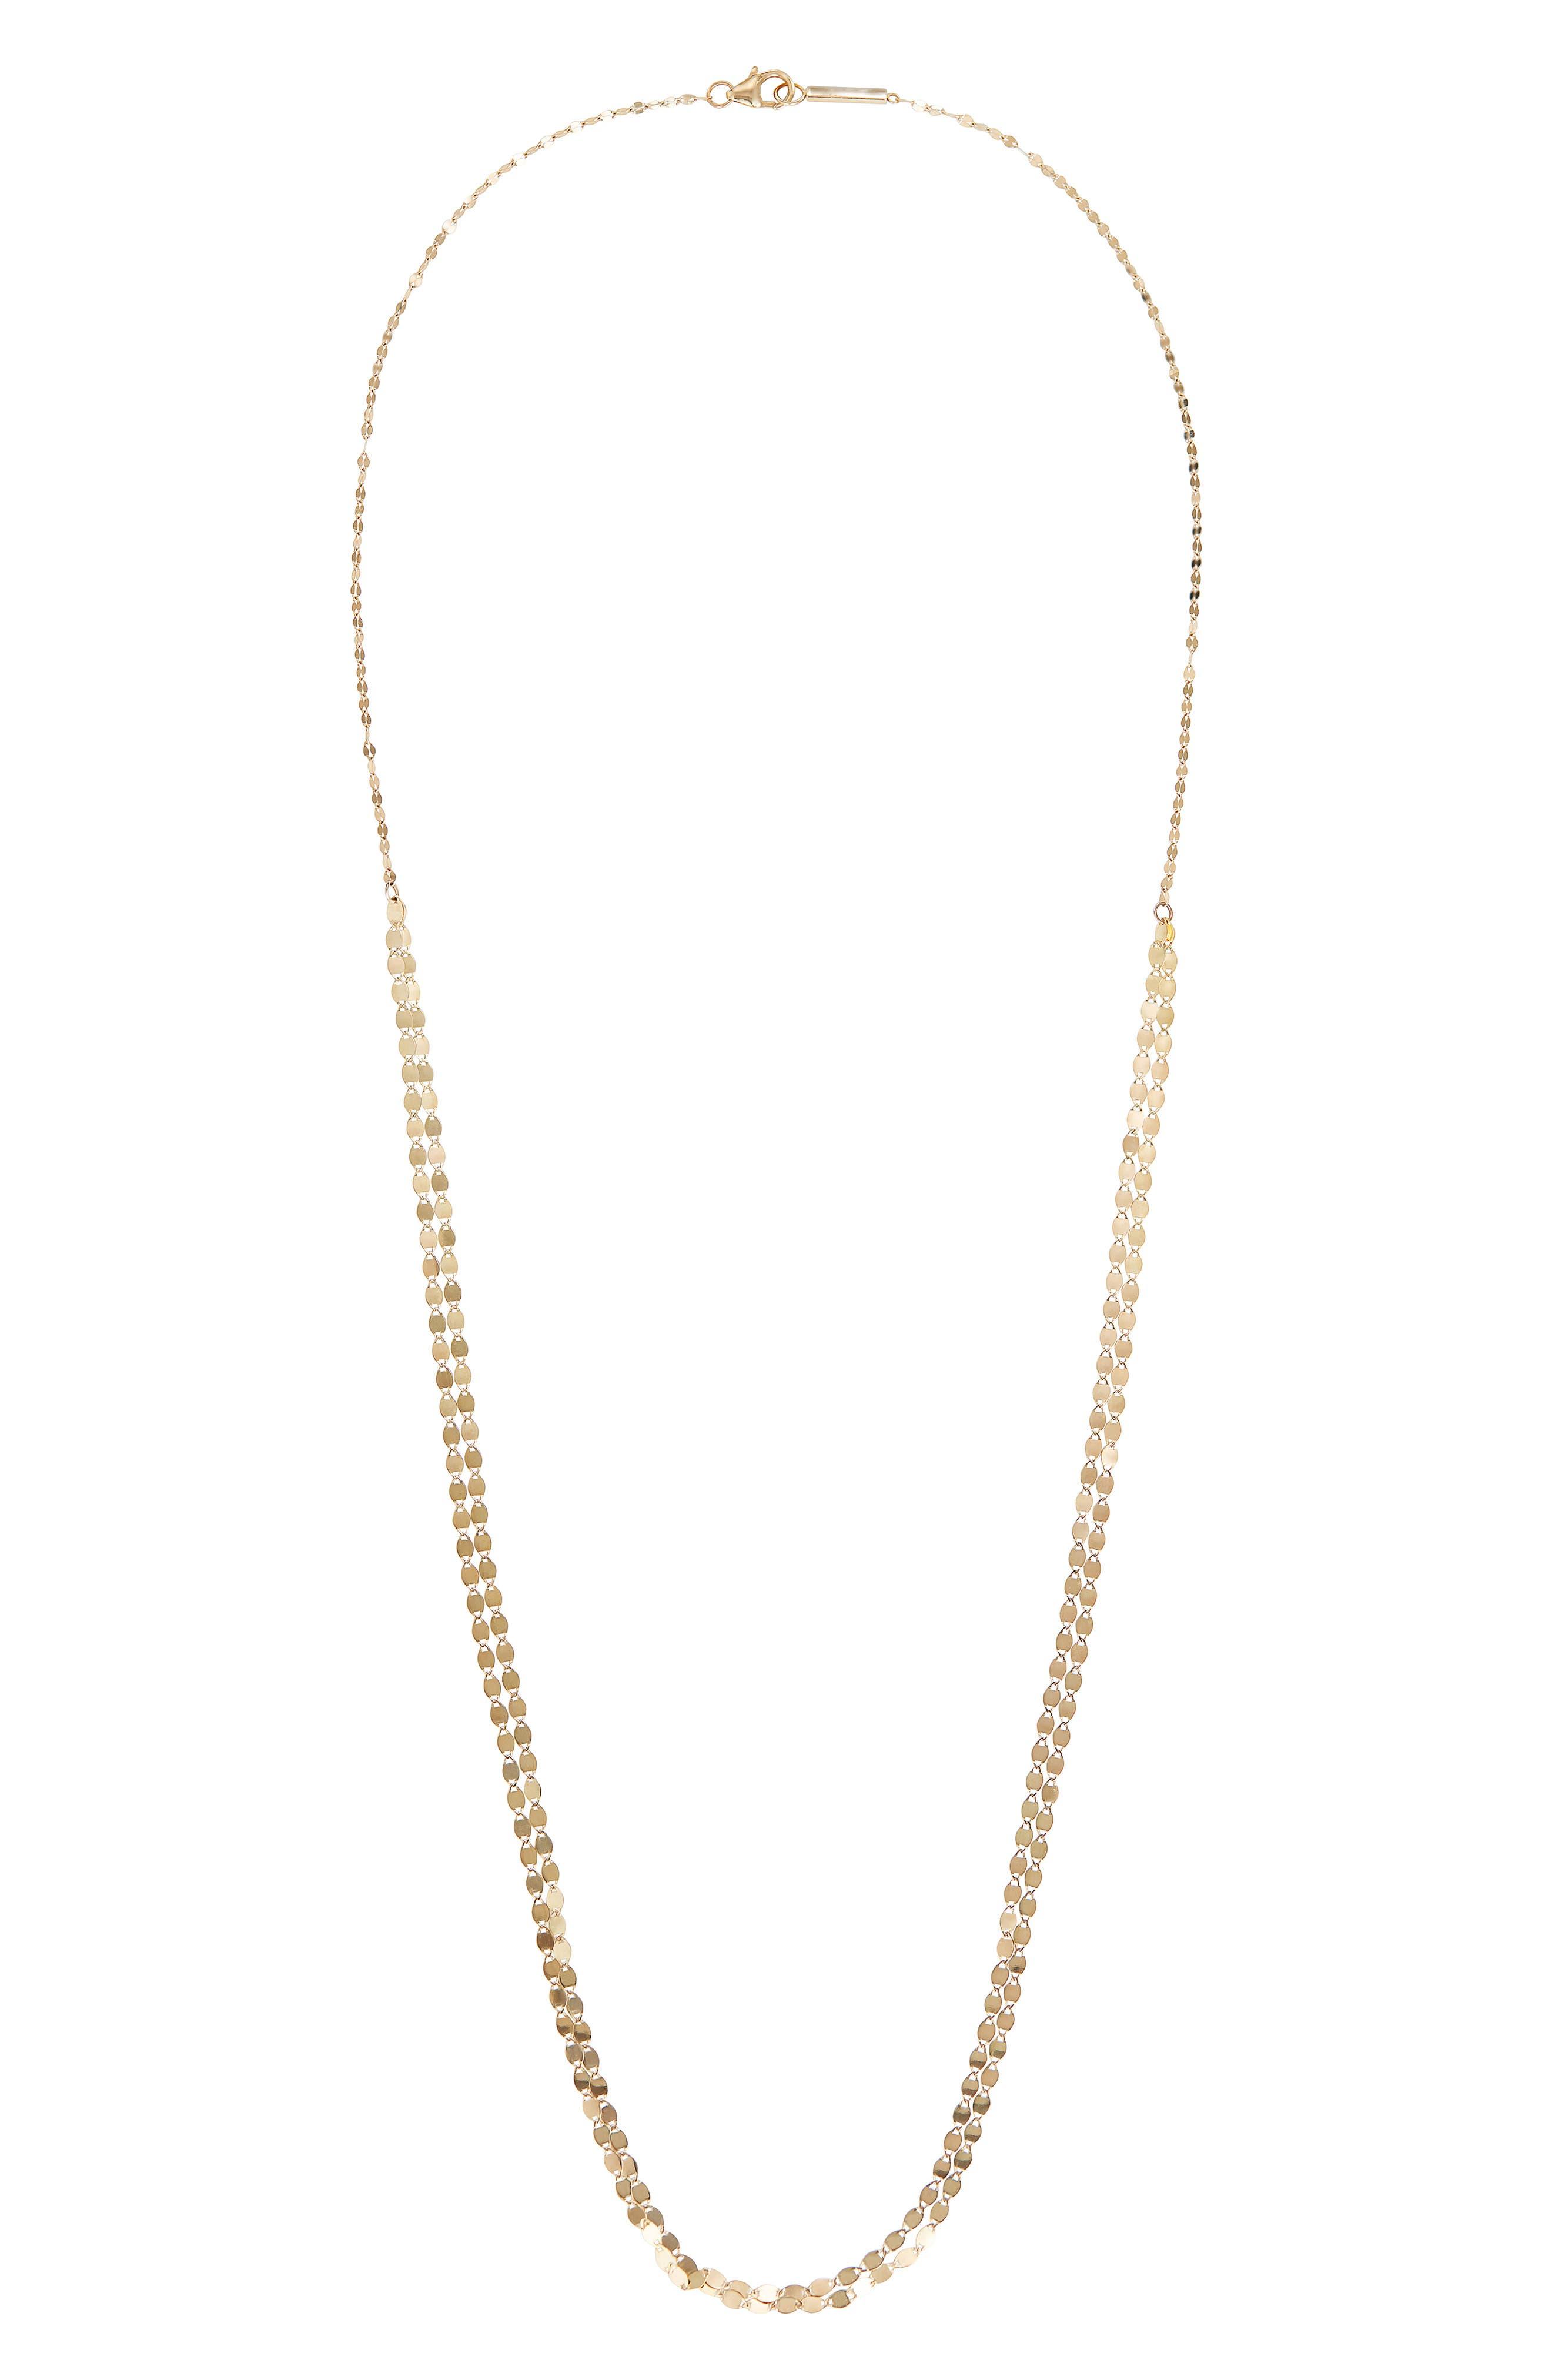 Blush Necklace,                             Alternate thumbnail 2, color,                             GOLD